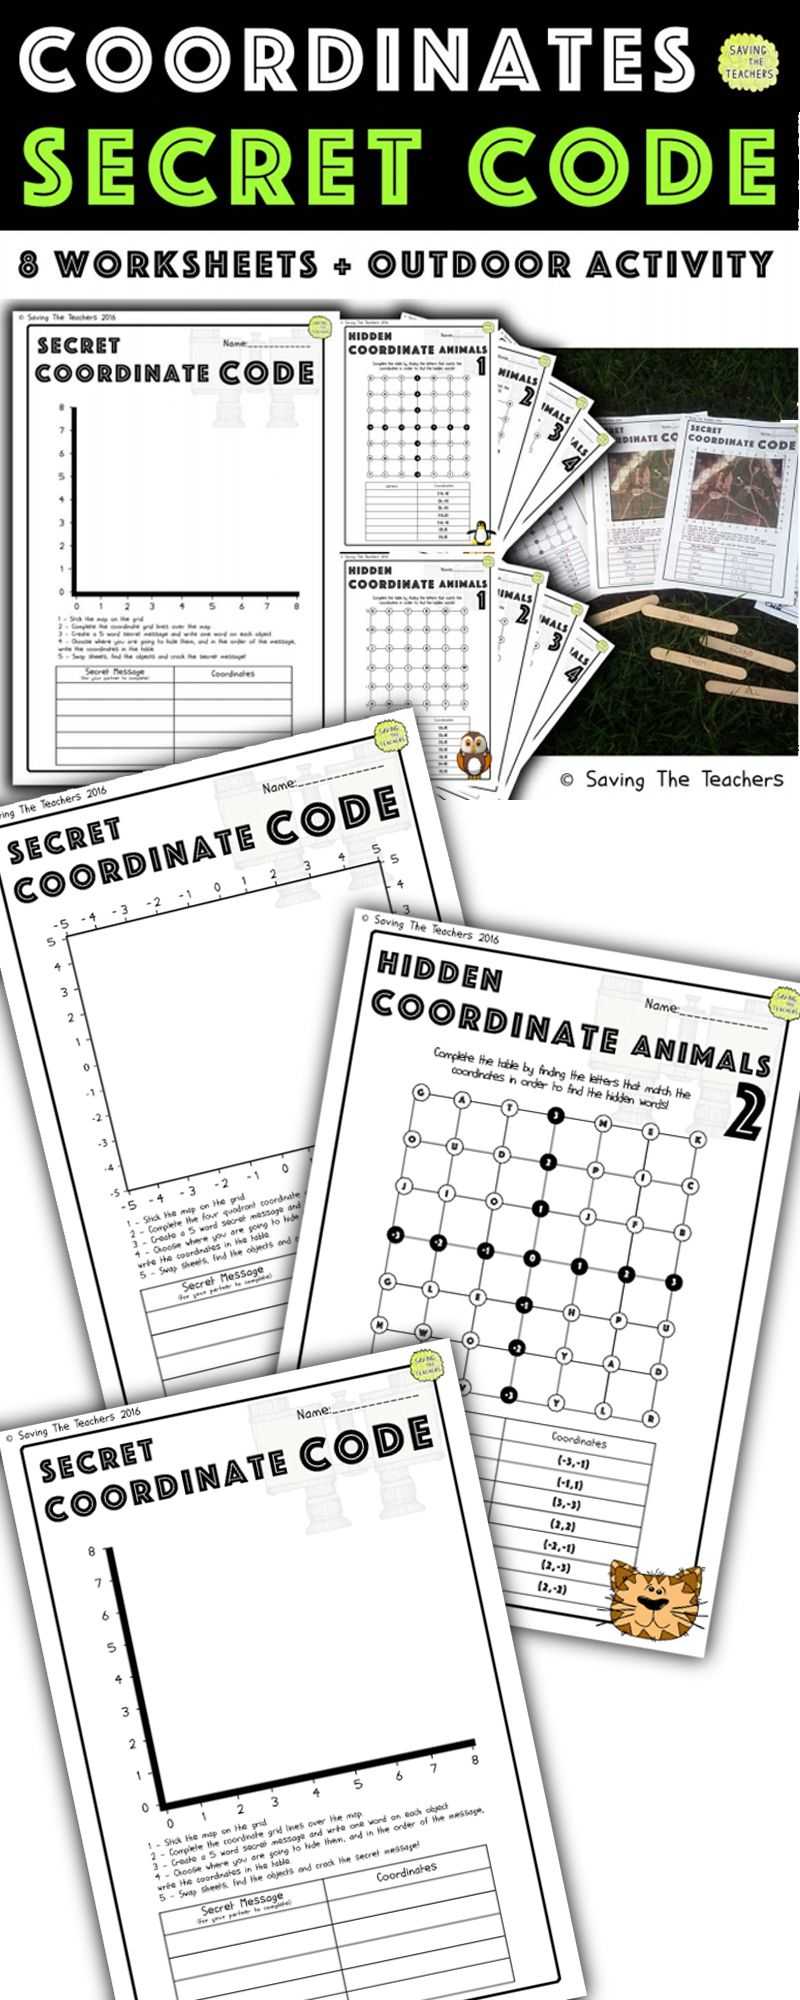 Outdoor Coordinates Activity And Worksheets The Children Will Love Running Around Using Coordinate Fun Math Activities Homeschool Programs Math Games For Kids [ 2000 x 800 Pixel ]